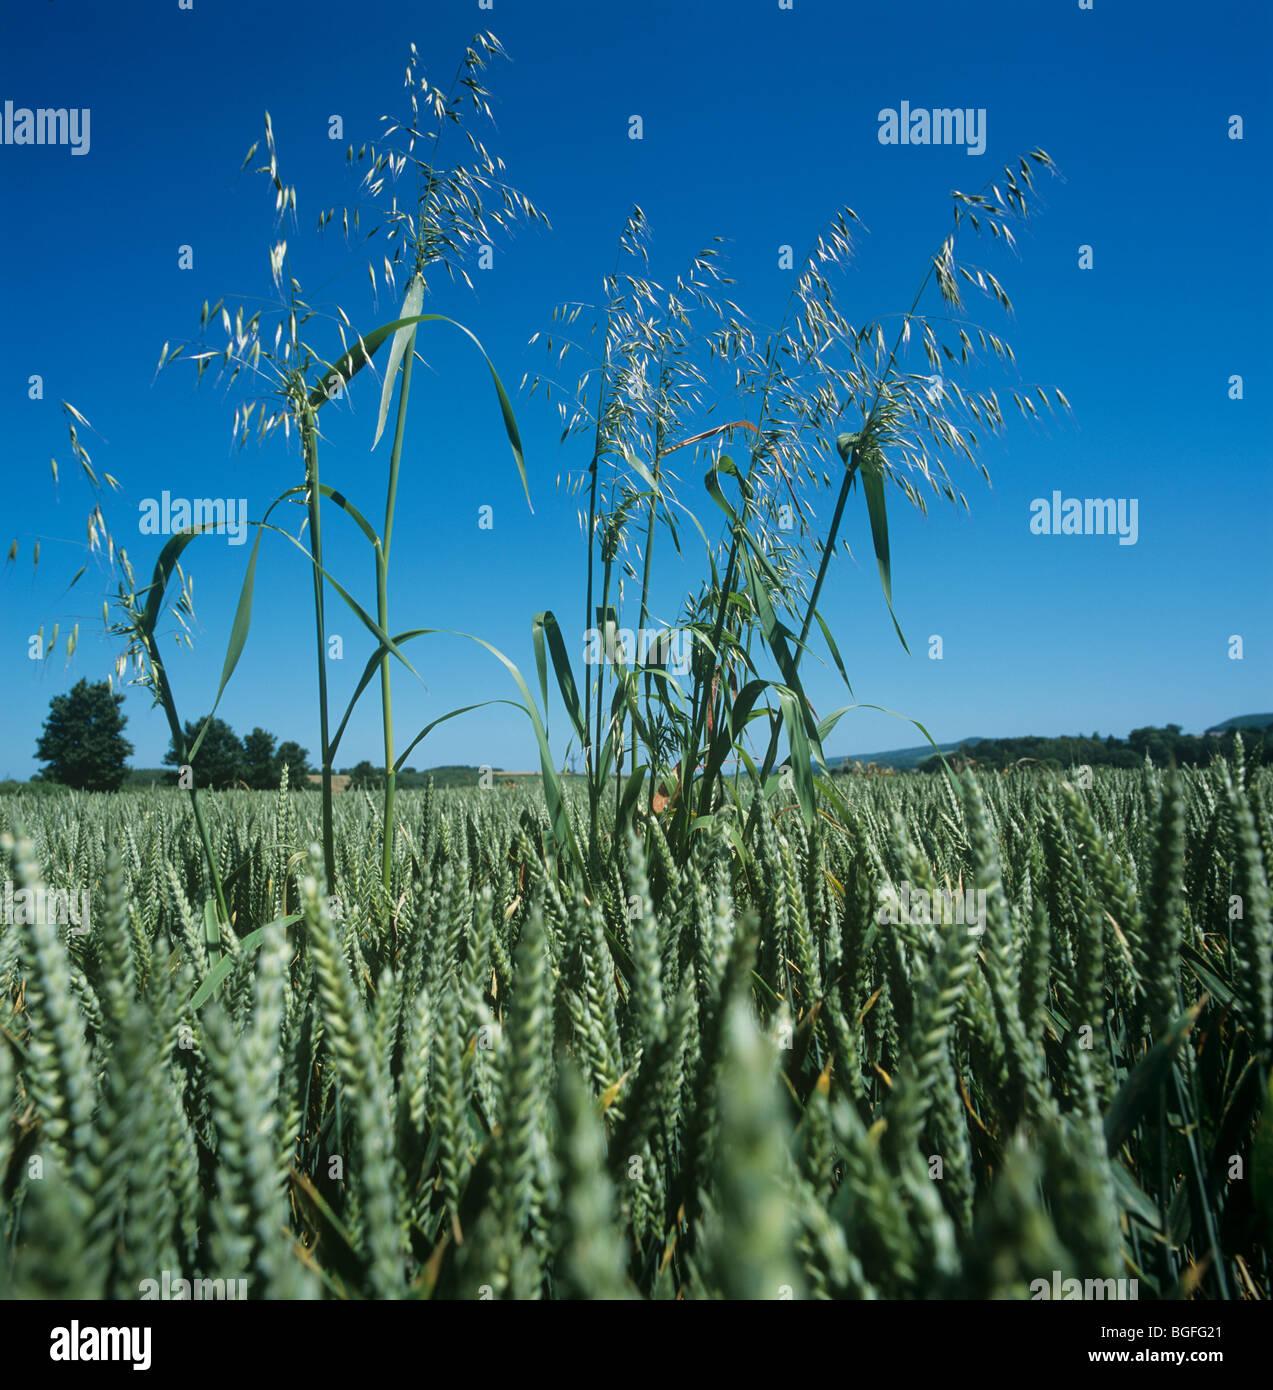 Wild oat (Avena fatua) panicles in wheat crop in ear Stock Photo